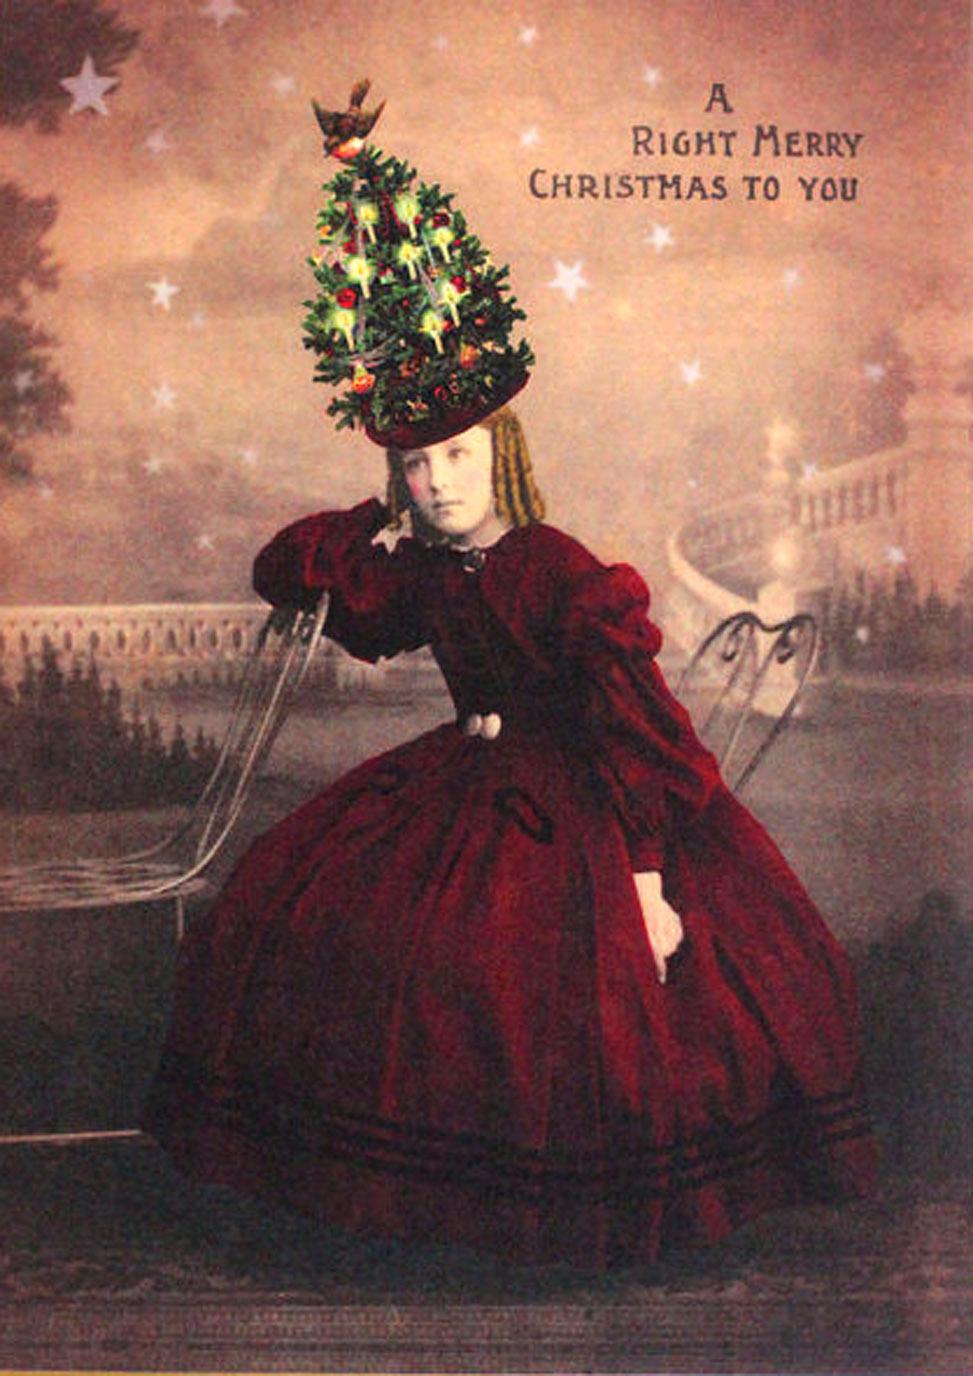 Funny Christmas Cards: Vintage, Printable Xmas Greetings